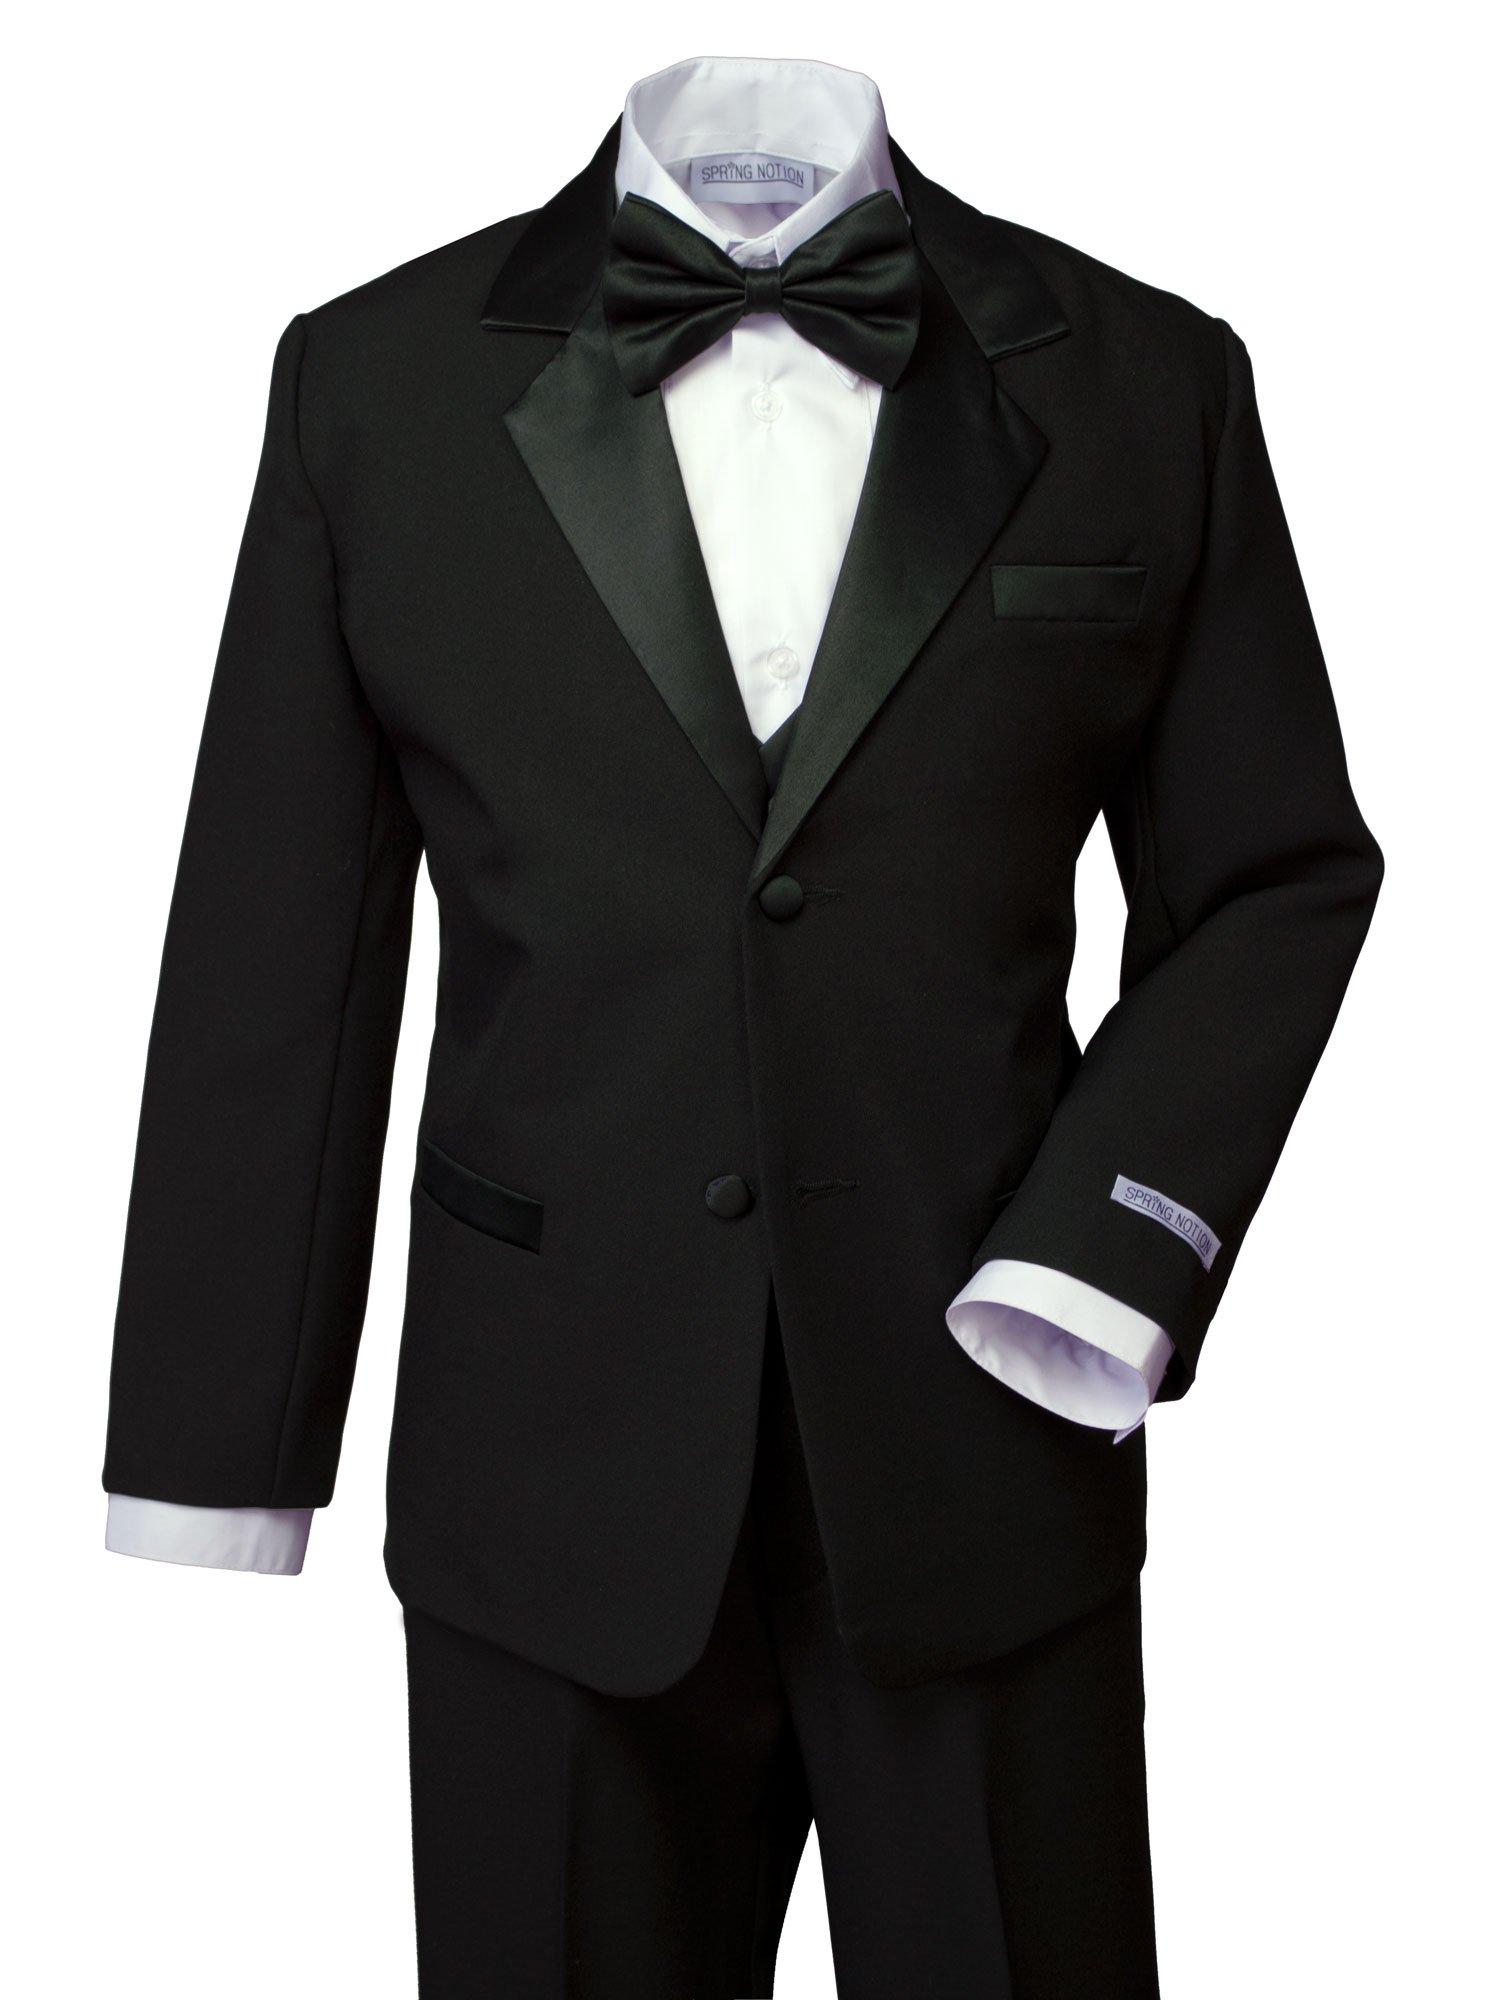 Spring Notion Boys' Classic Fit Tuxedo Set, No Tail 4T Black